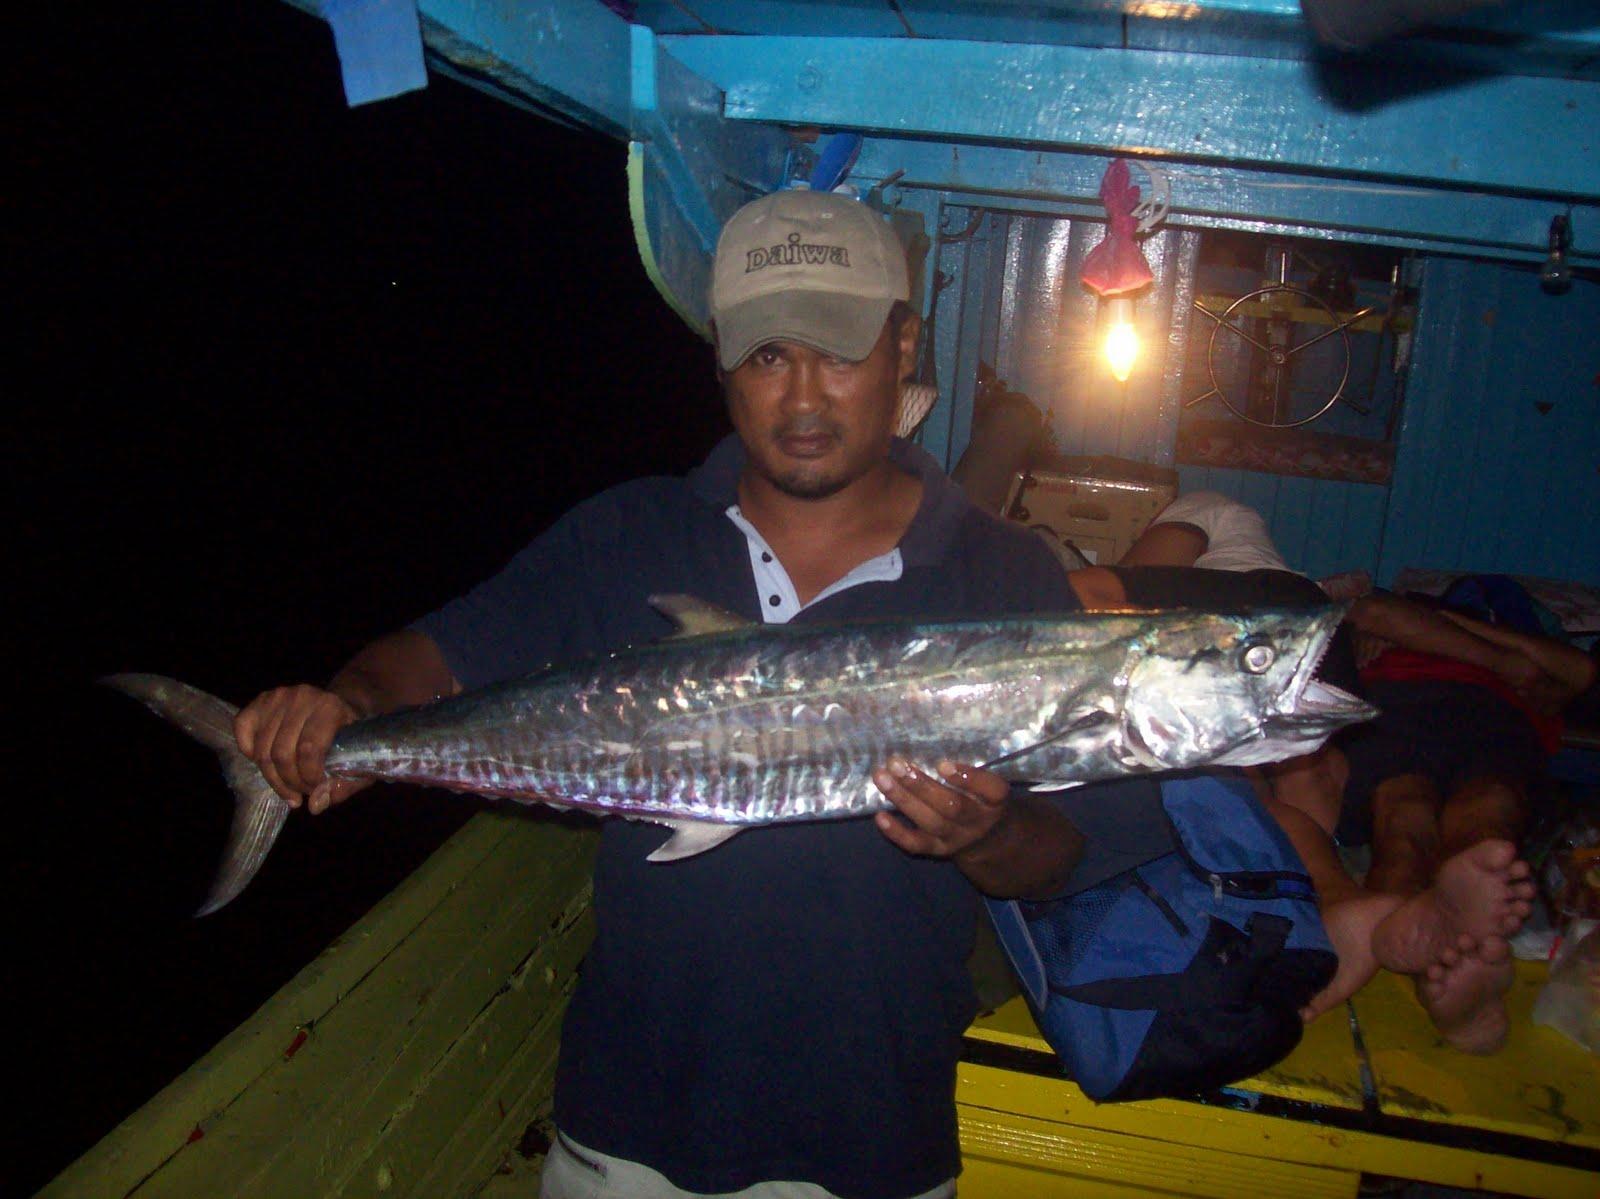 Fishing Equipment May 2010 Umpan Pancing Soft Tiddler Luminous Gid Bro Yang Peramahikan Apo Tu